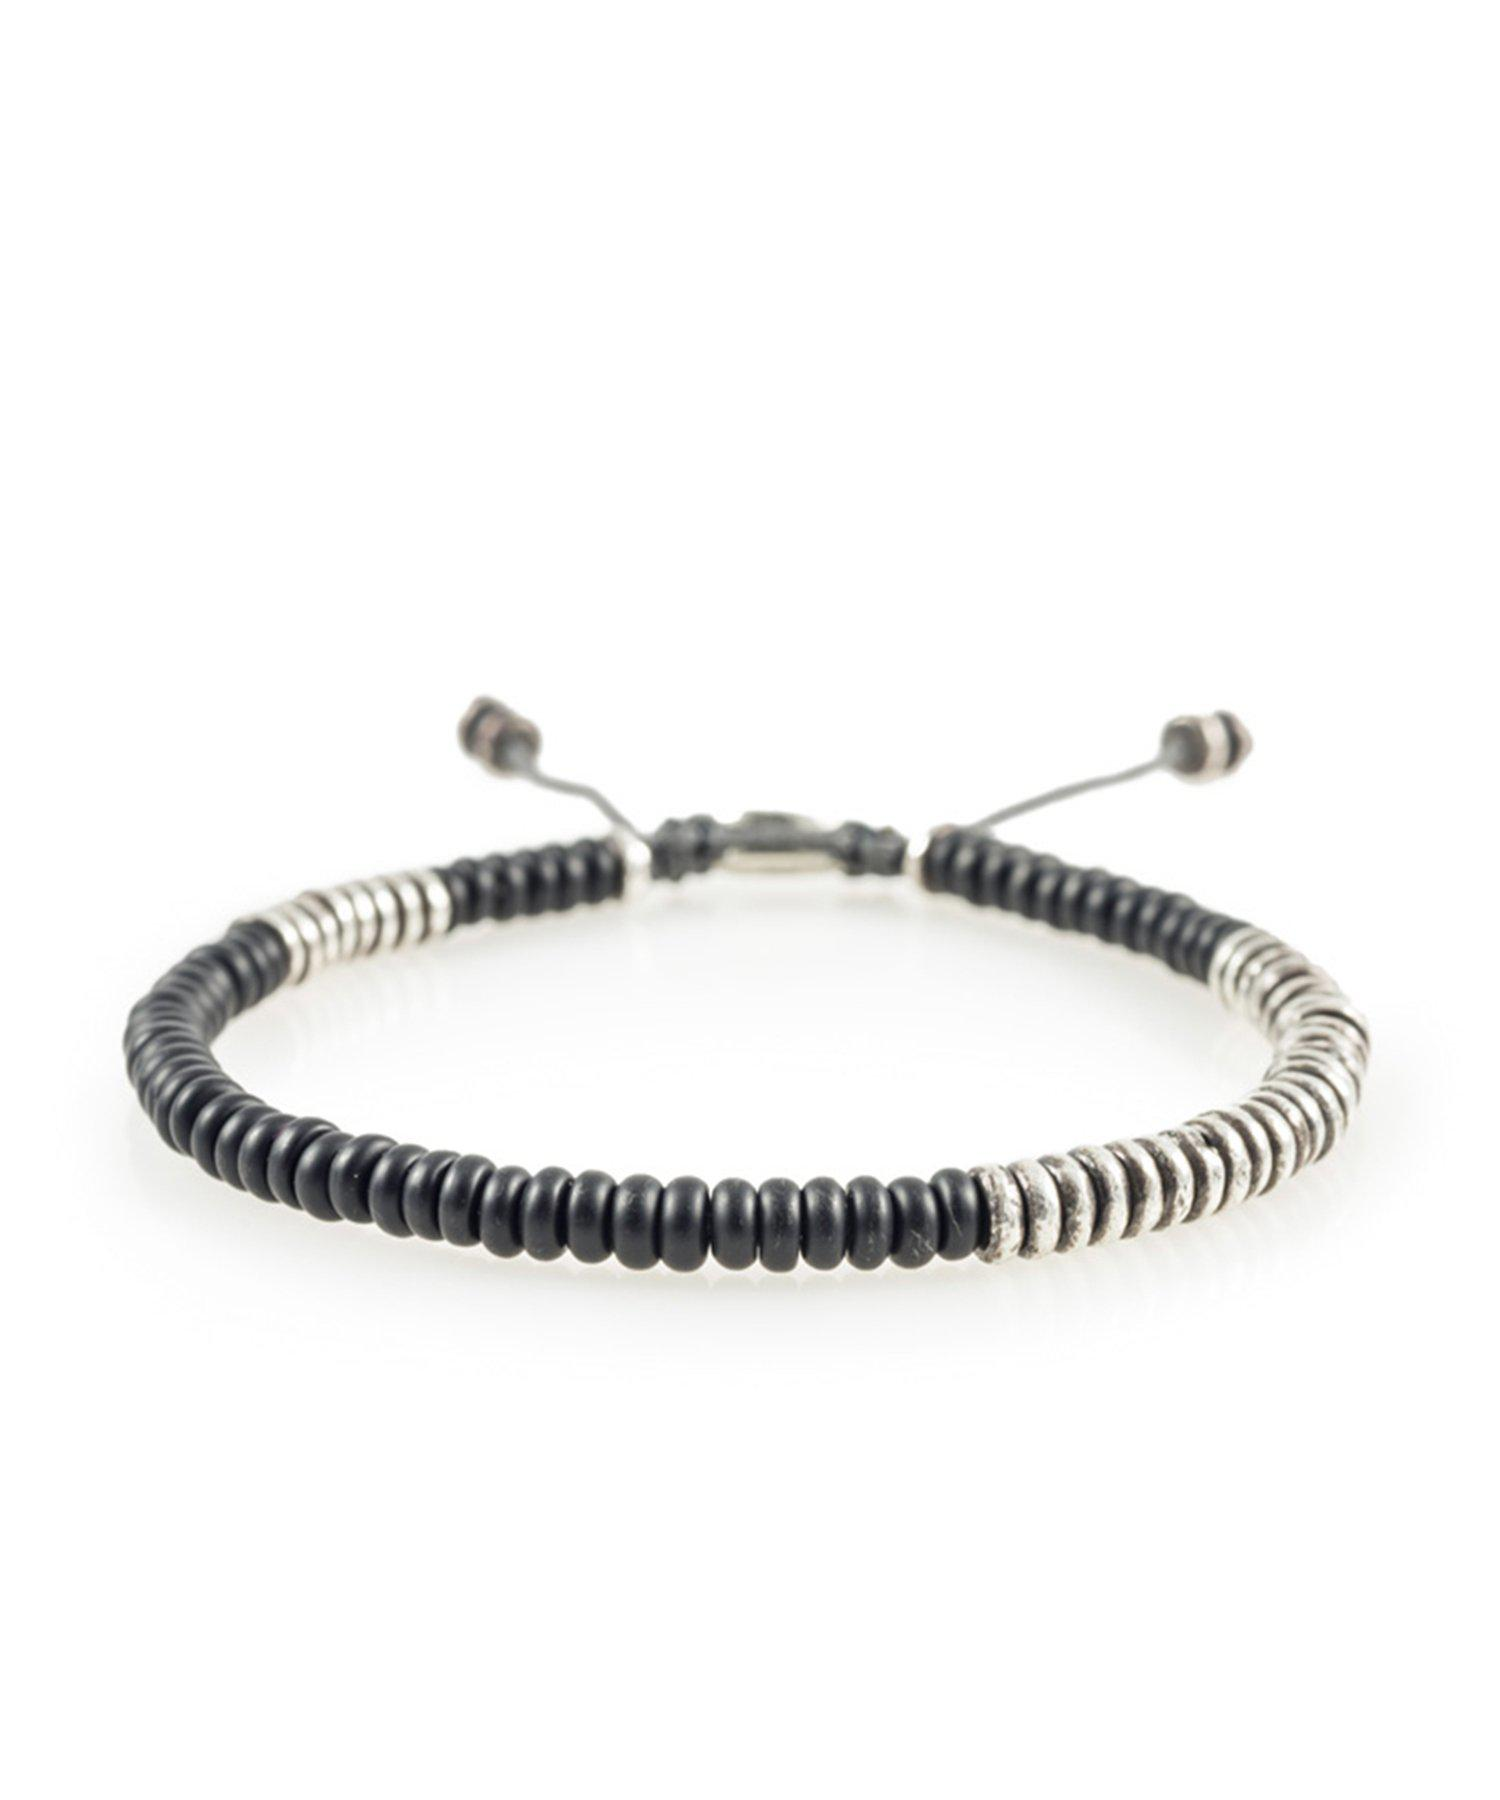 M. Cohen Onyx And Sterling Silver Bracelet - Black 6uLLcSK